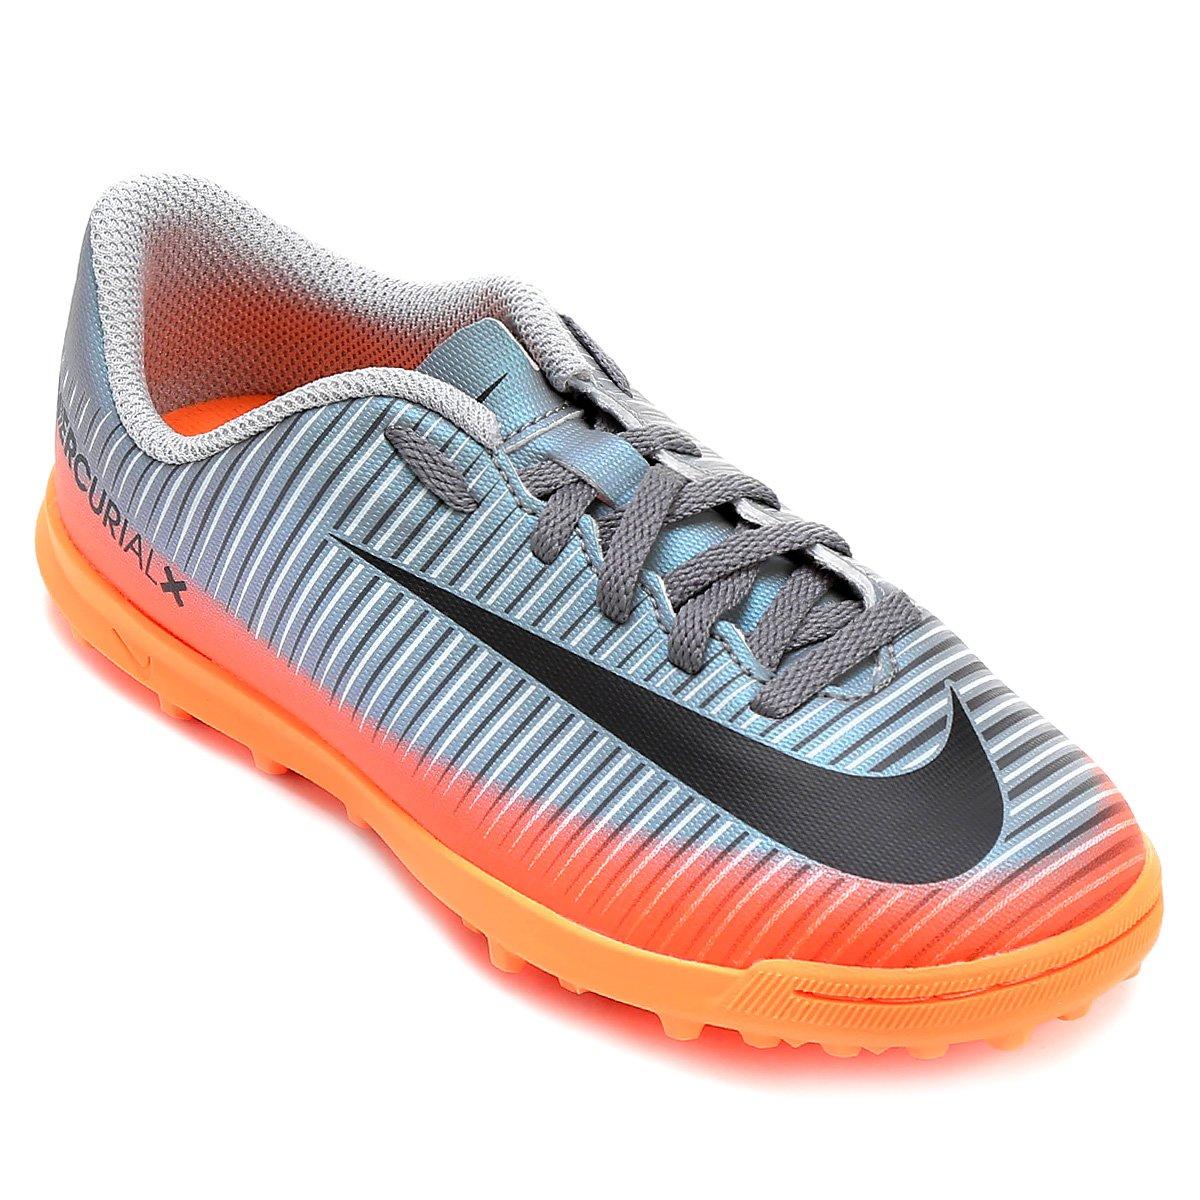 109754cf02d7f Chuteira Society Infantil Nike Mercurial X Vortex 3 CR7 TF - Compre Agora